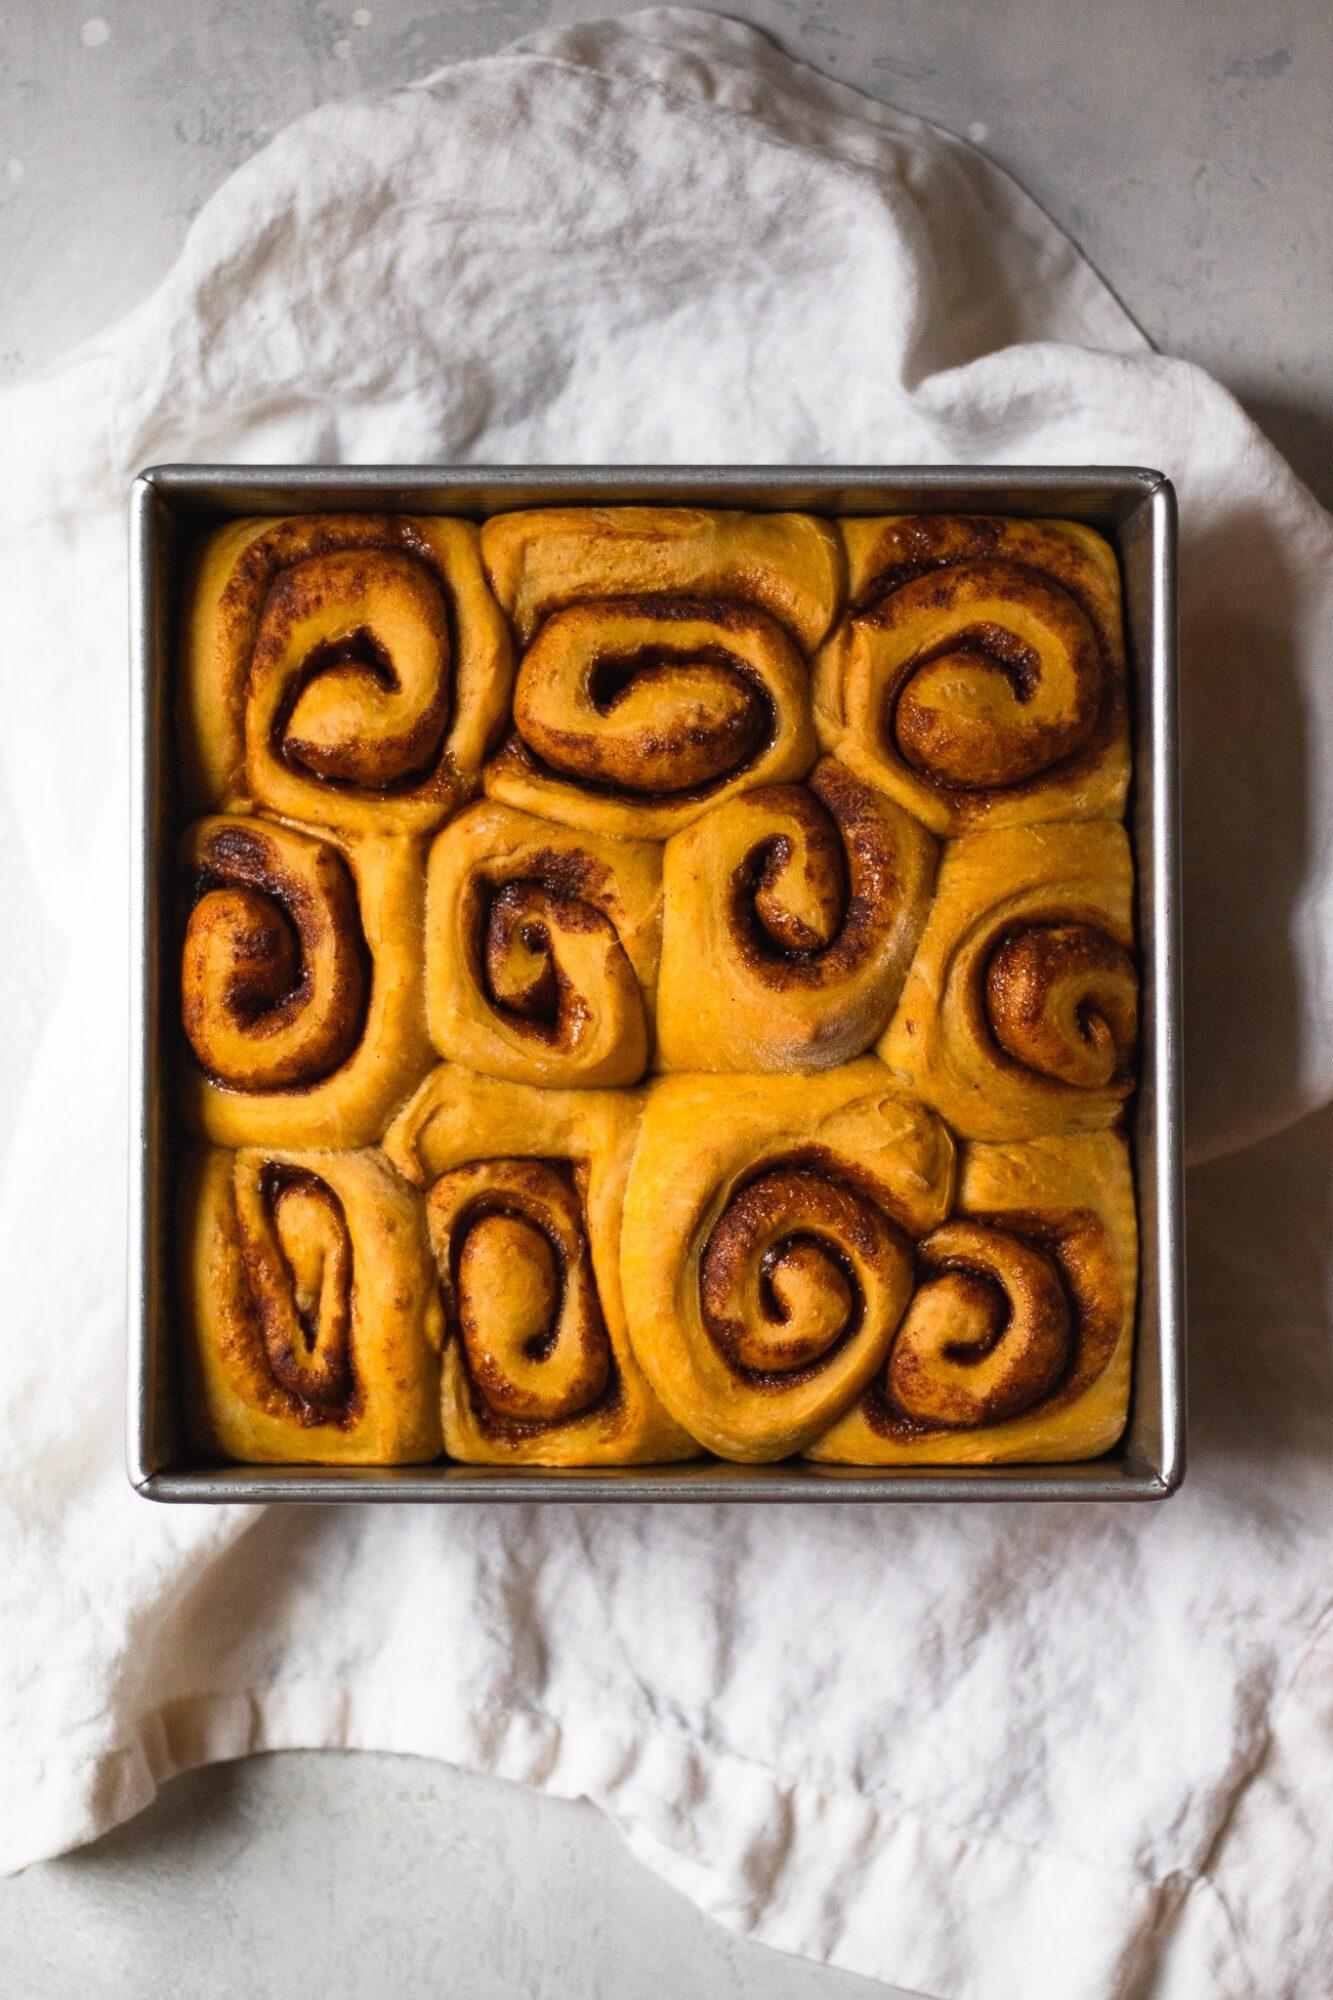 cinnamon rolls after baking